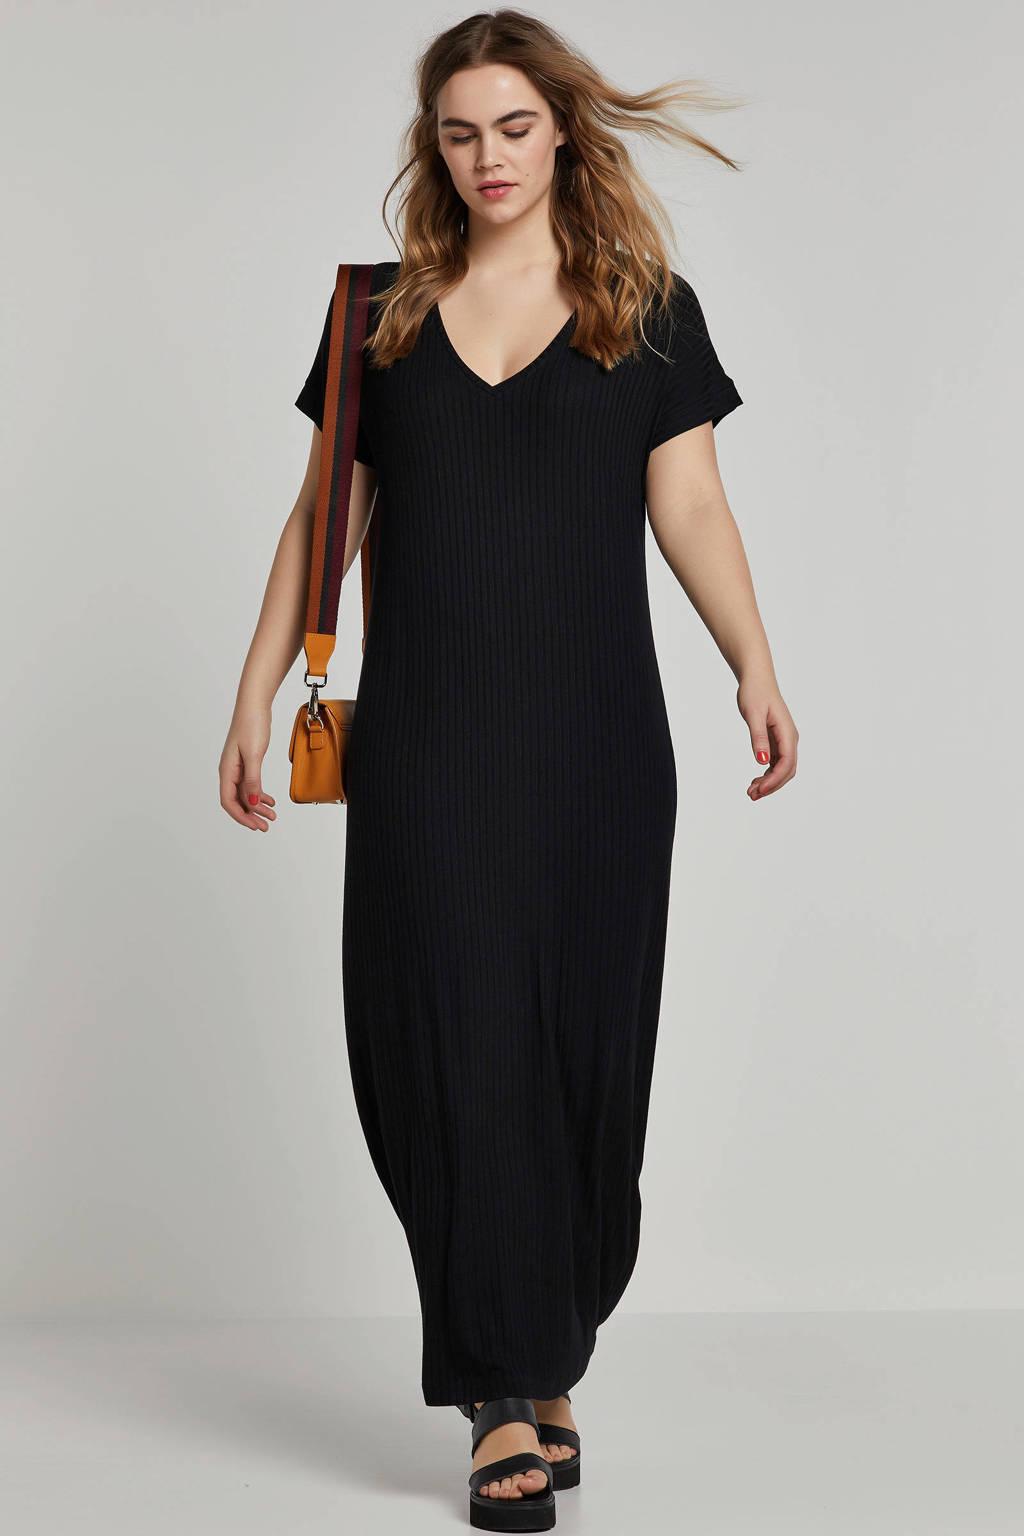 Mat Fashion jurk met V-hals en textuur, Zwart